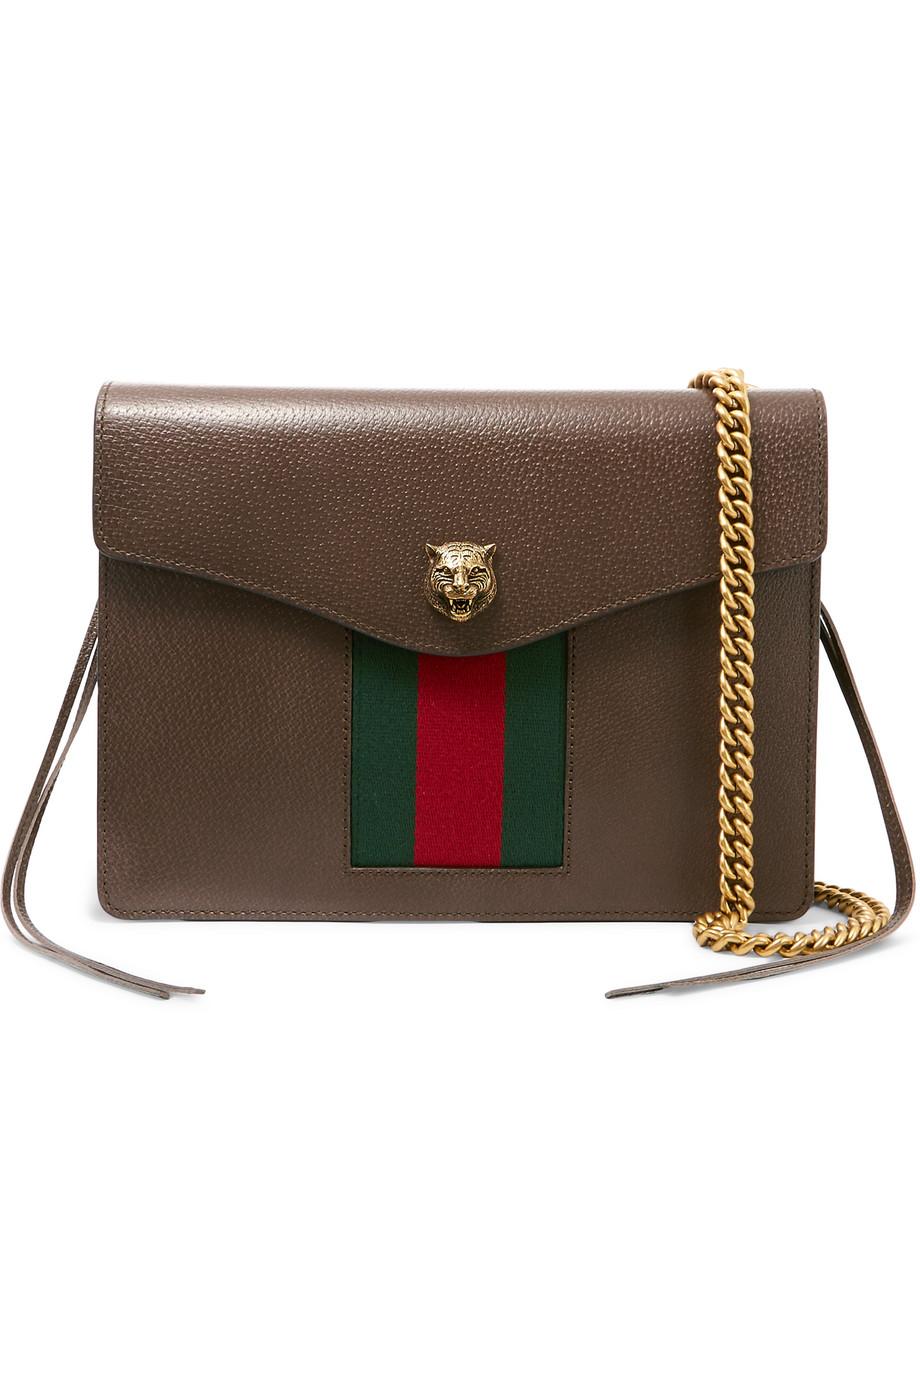 Gucci Animalier Tasseled Textured-Leather Shoulder Bag, Brown, Women's